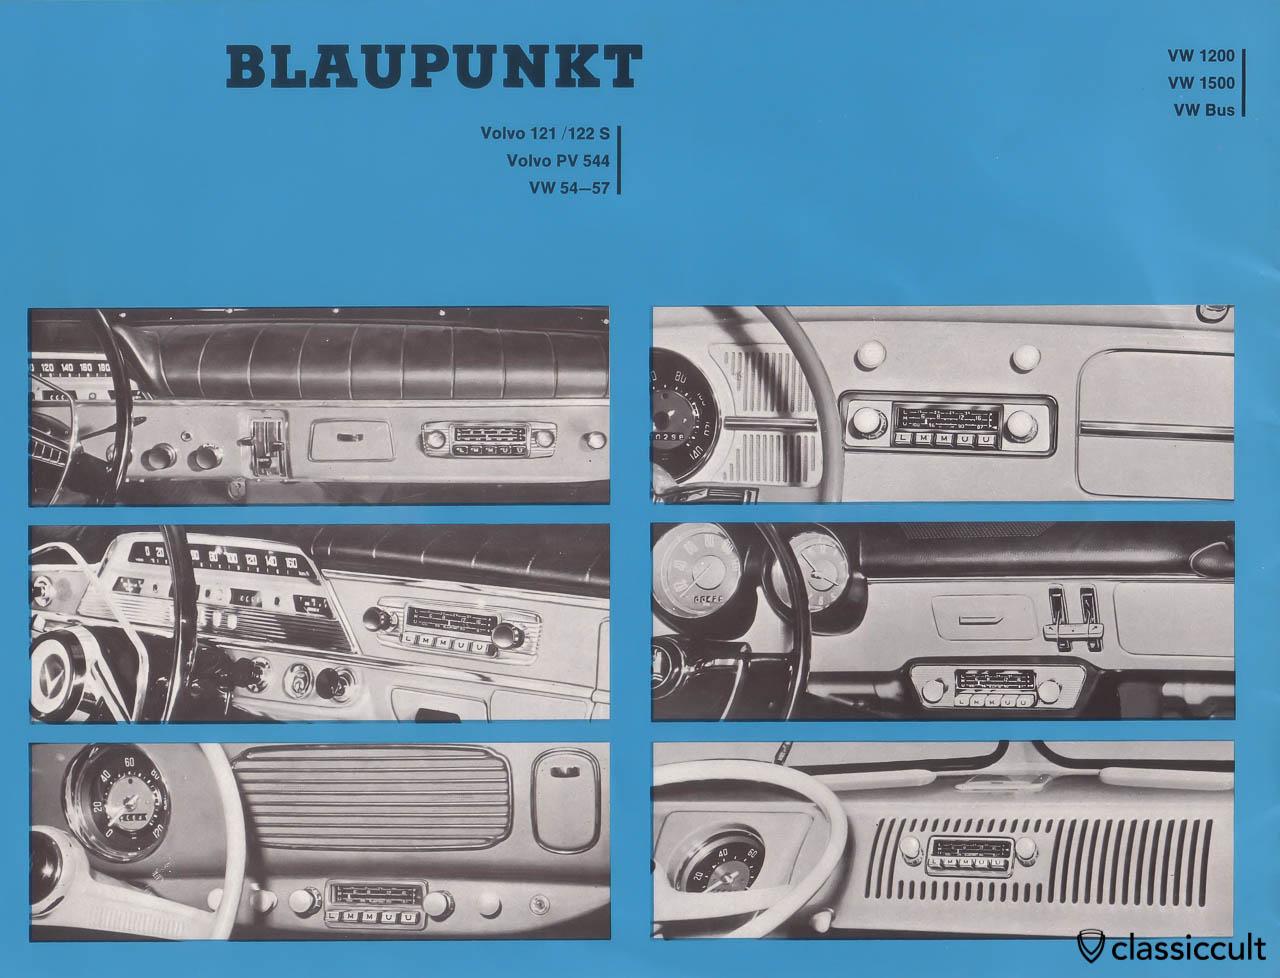 Blaupunkt car radio brochure 1963 classiccult for Porta prospekt hannover